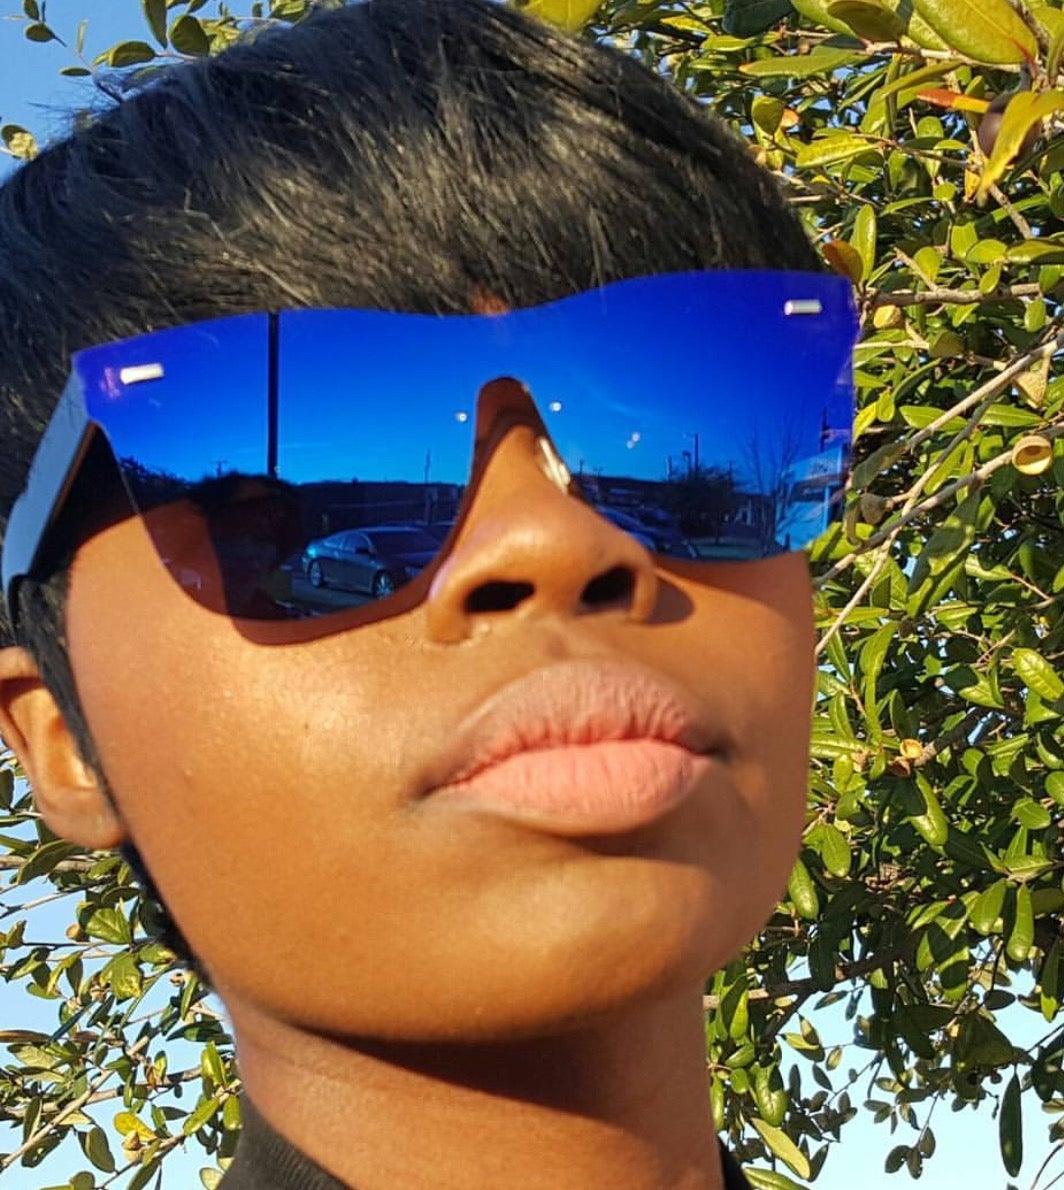 WINK SHADES — ZOEY REFLECTORS (Designer Inspired)